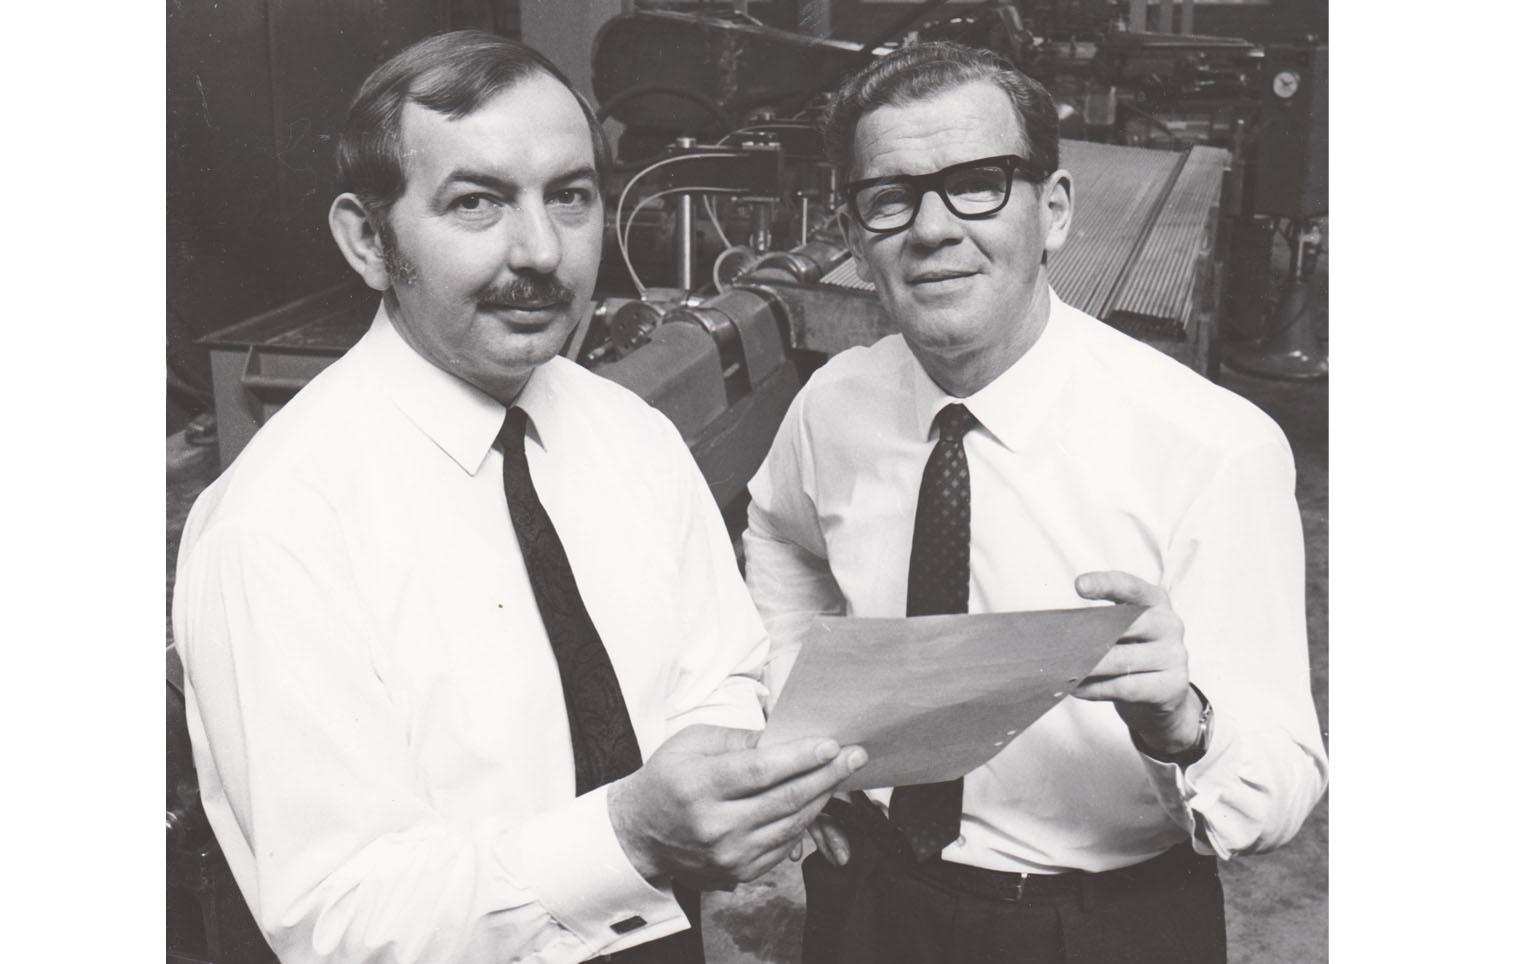 Ingenjörerna Josef Michna och Bengt Unenge